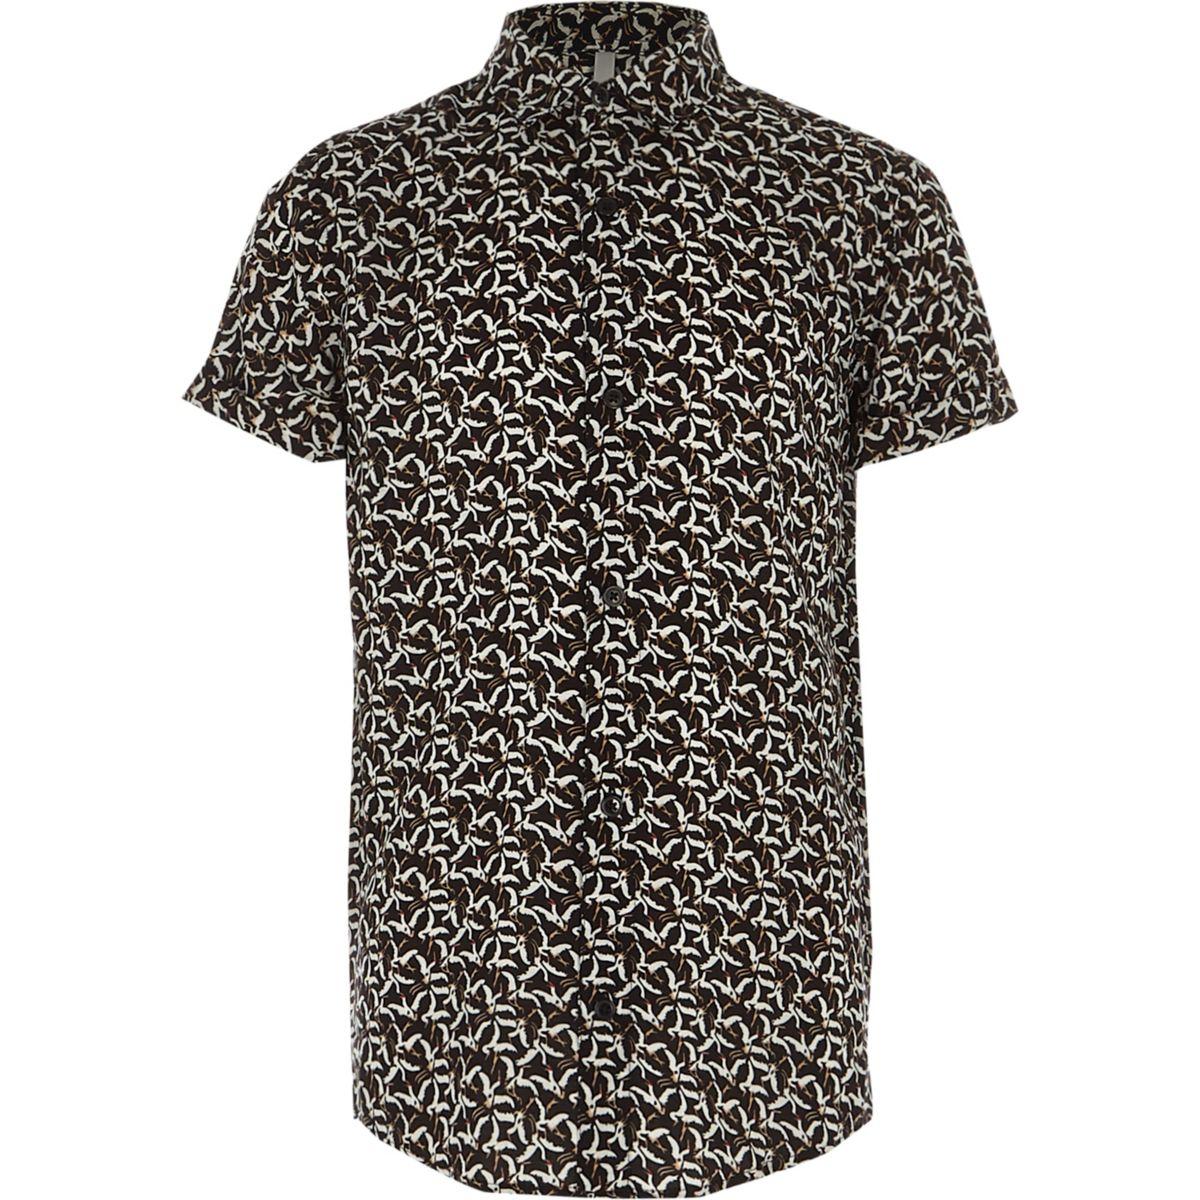 Boys black bird print short sleeve shirt